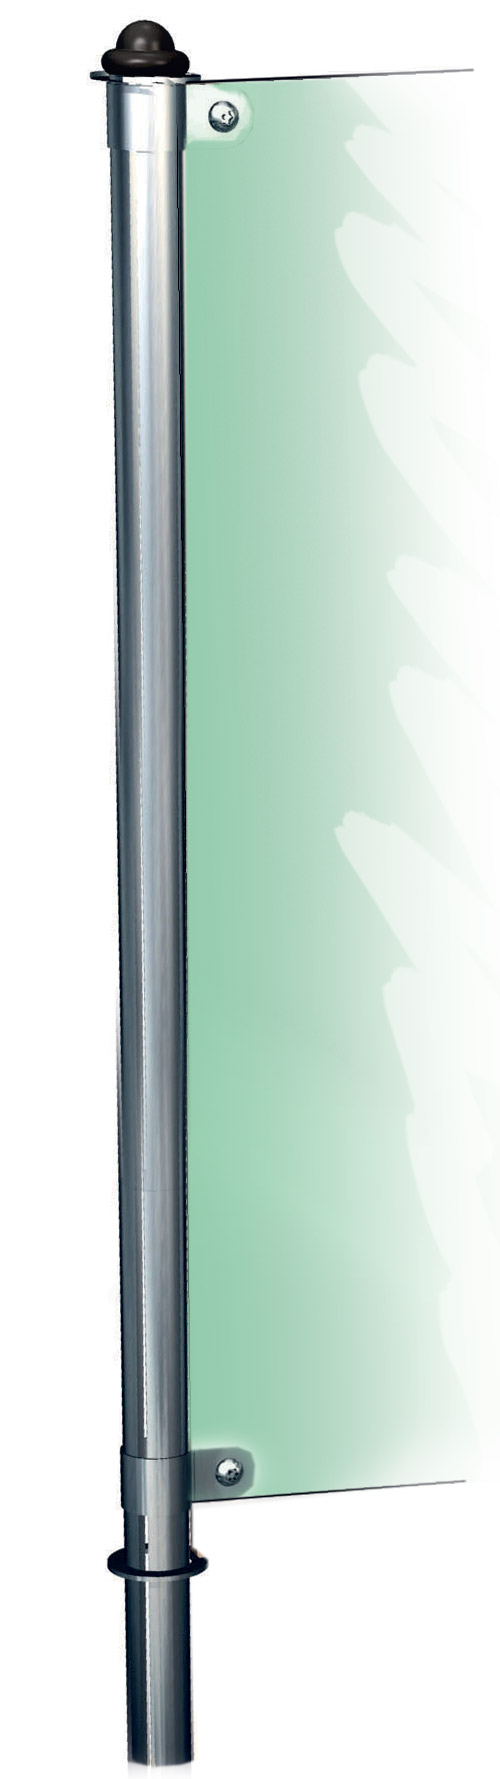 G3423